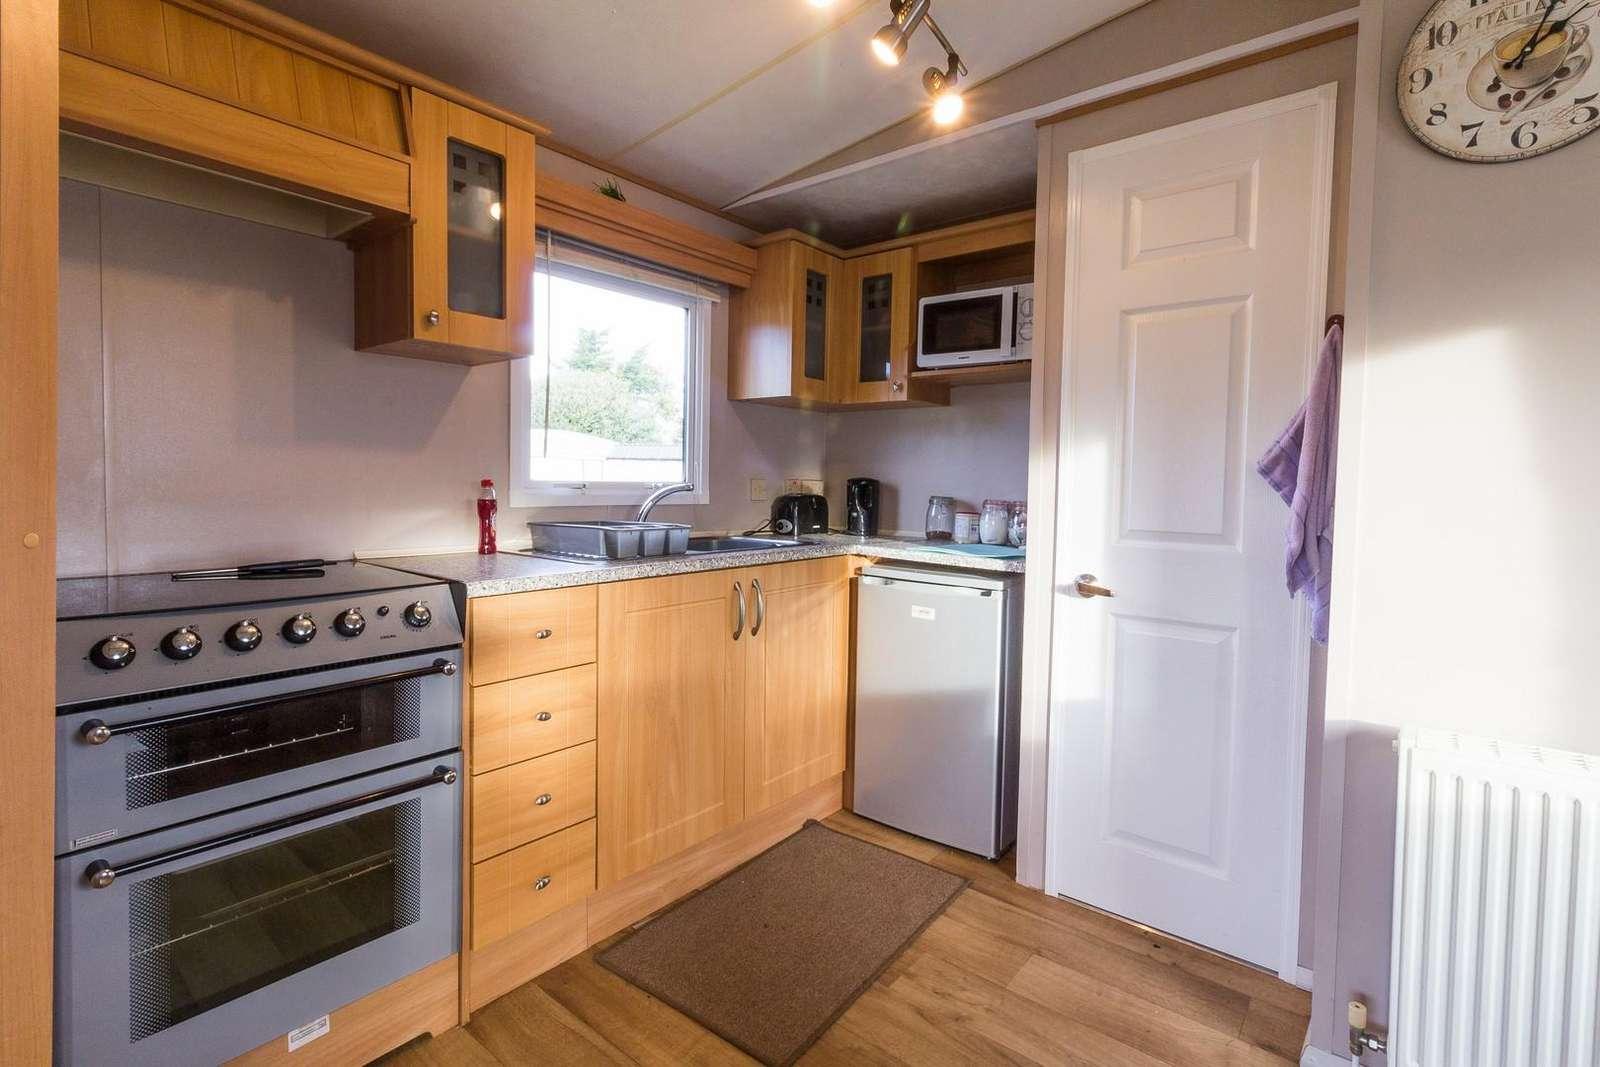 Caravan for rent near the Norfolk Broads